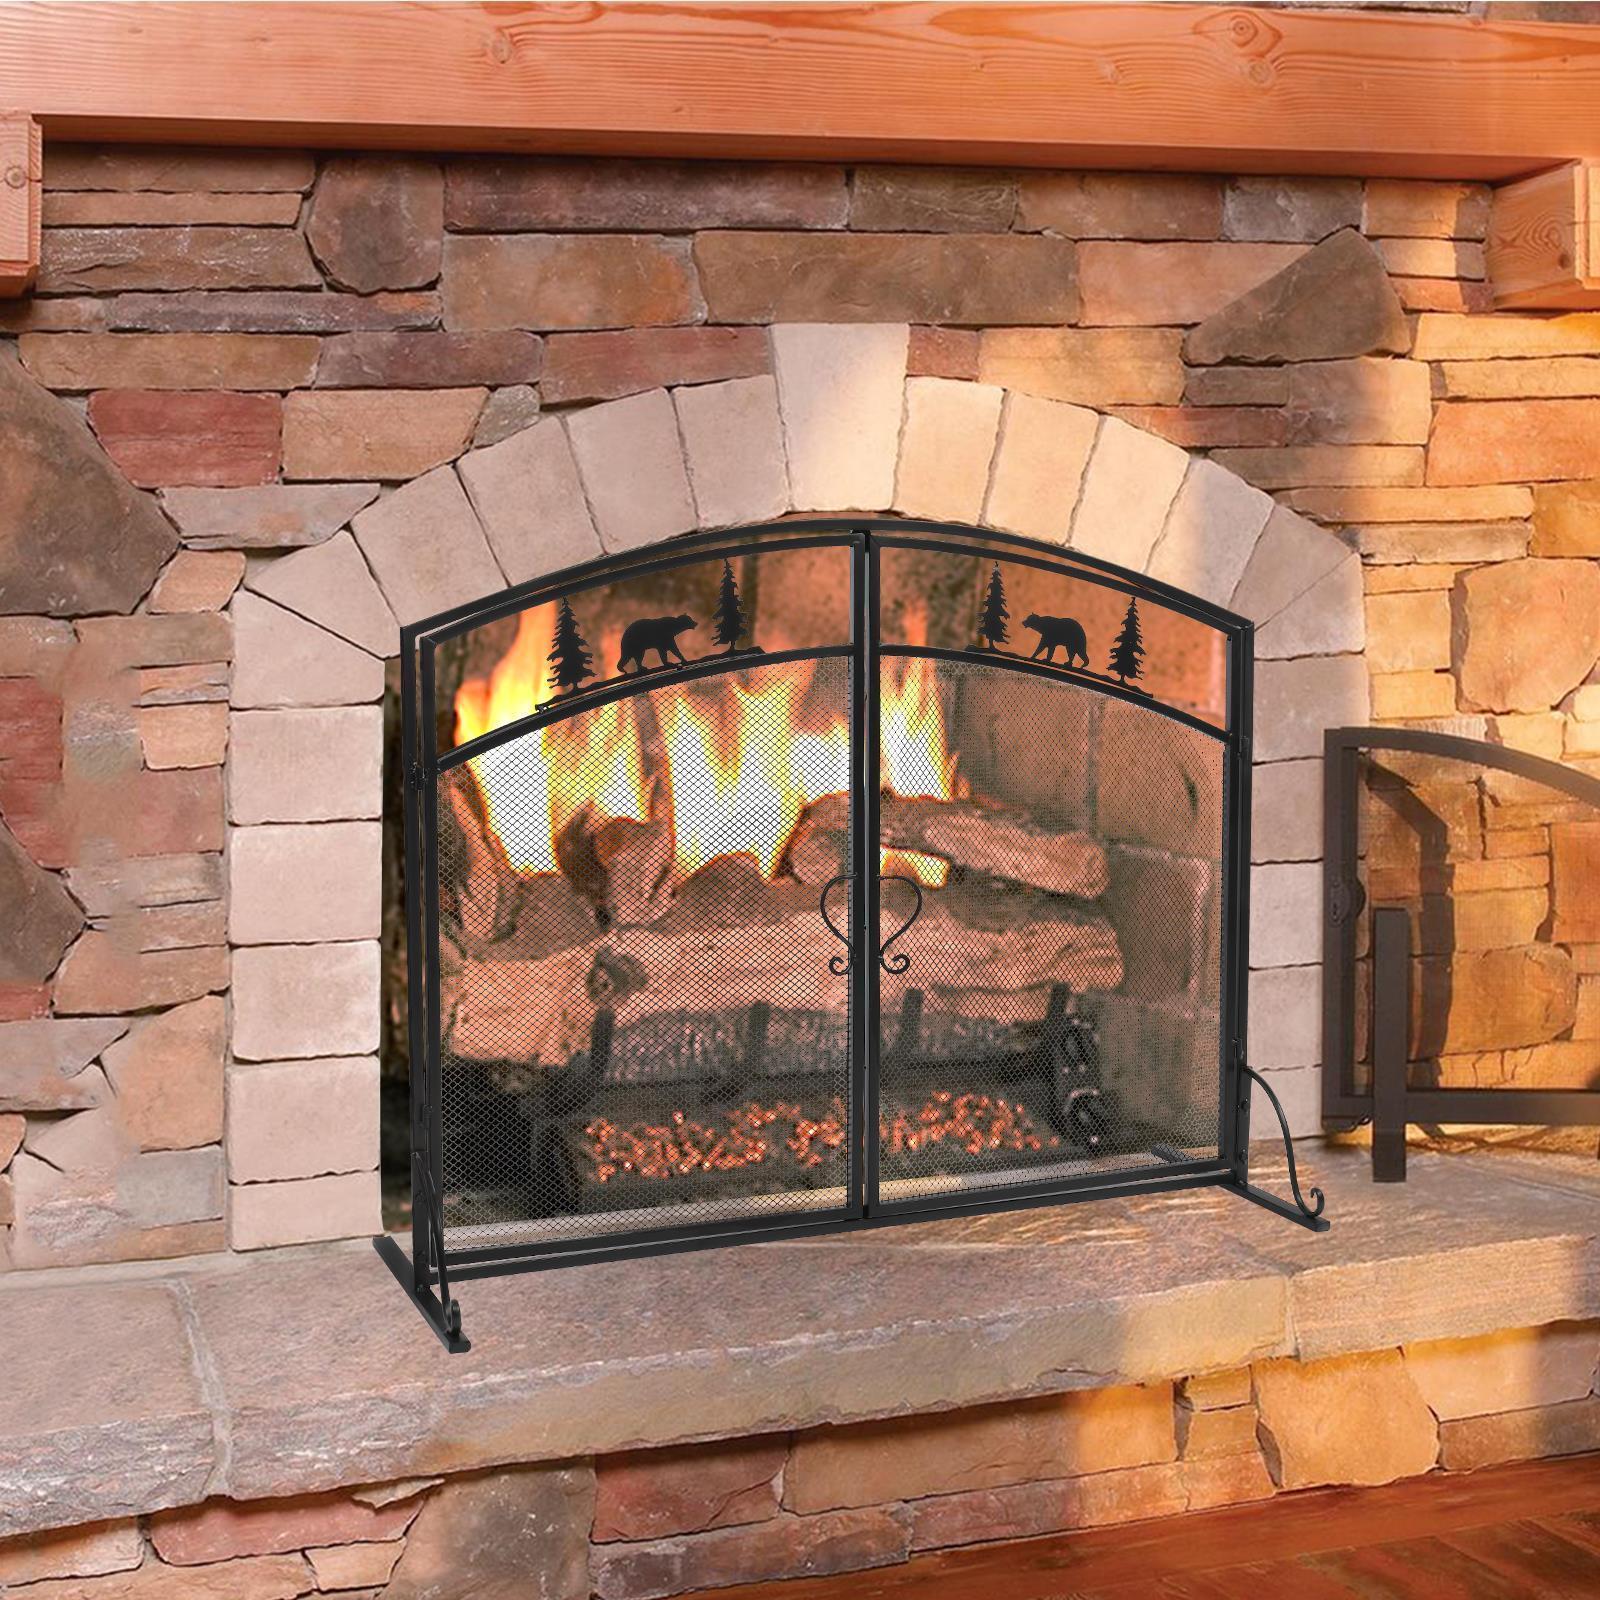 39 Single Panel Wrought Iron Fireplace Screen Decorative Fireplace Screen New Ebay